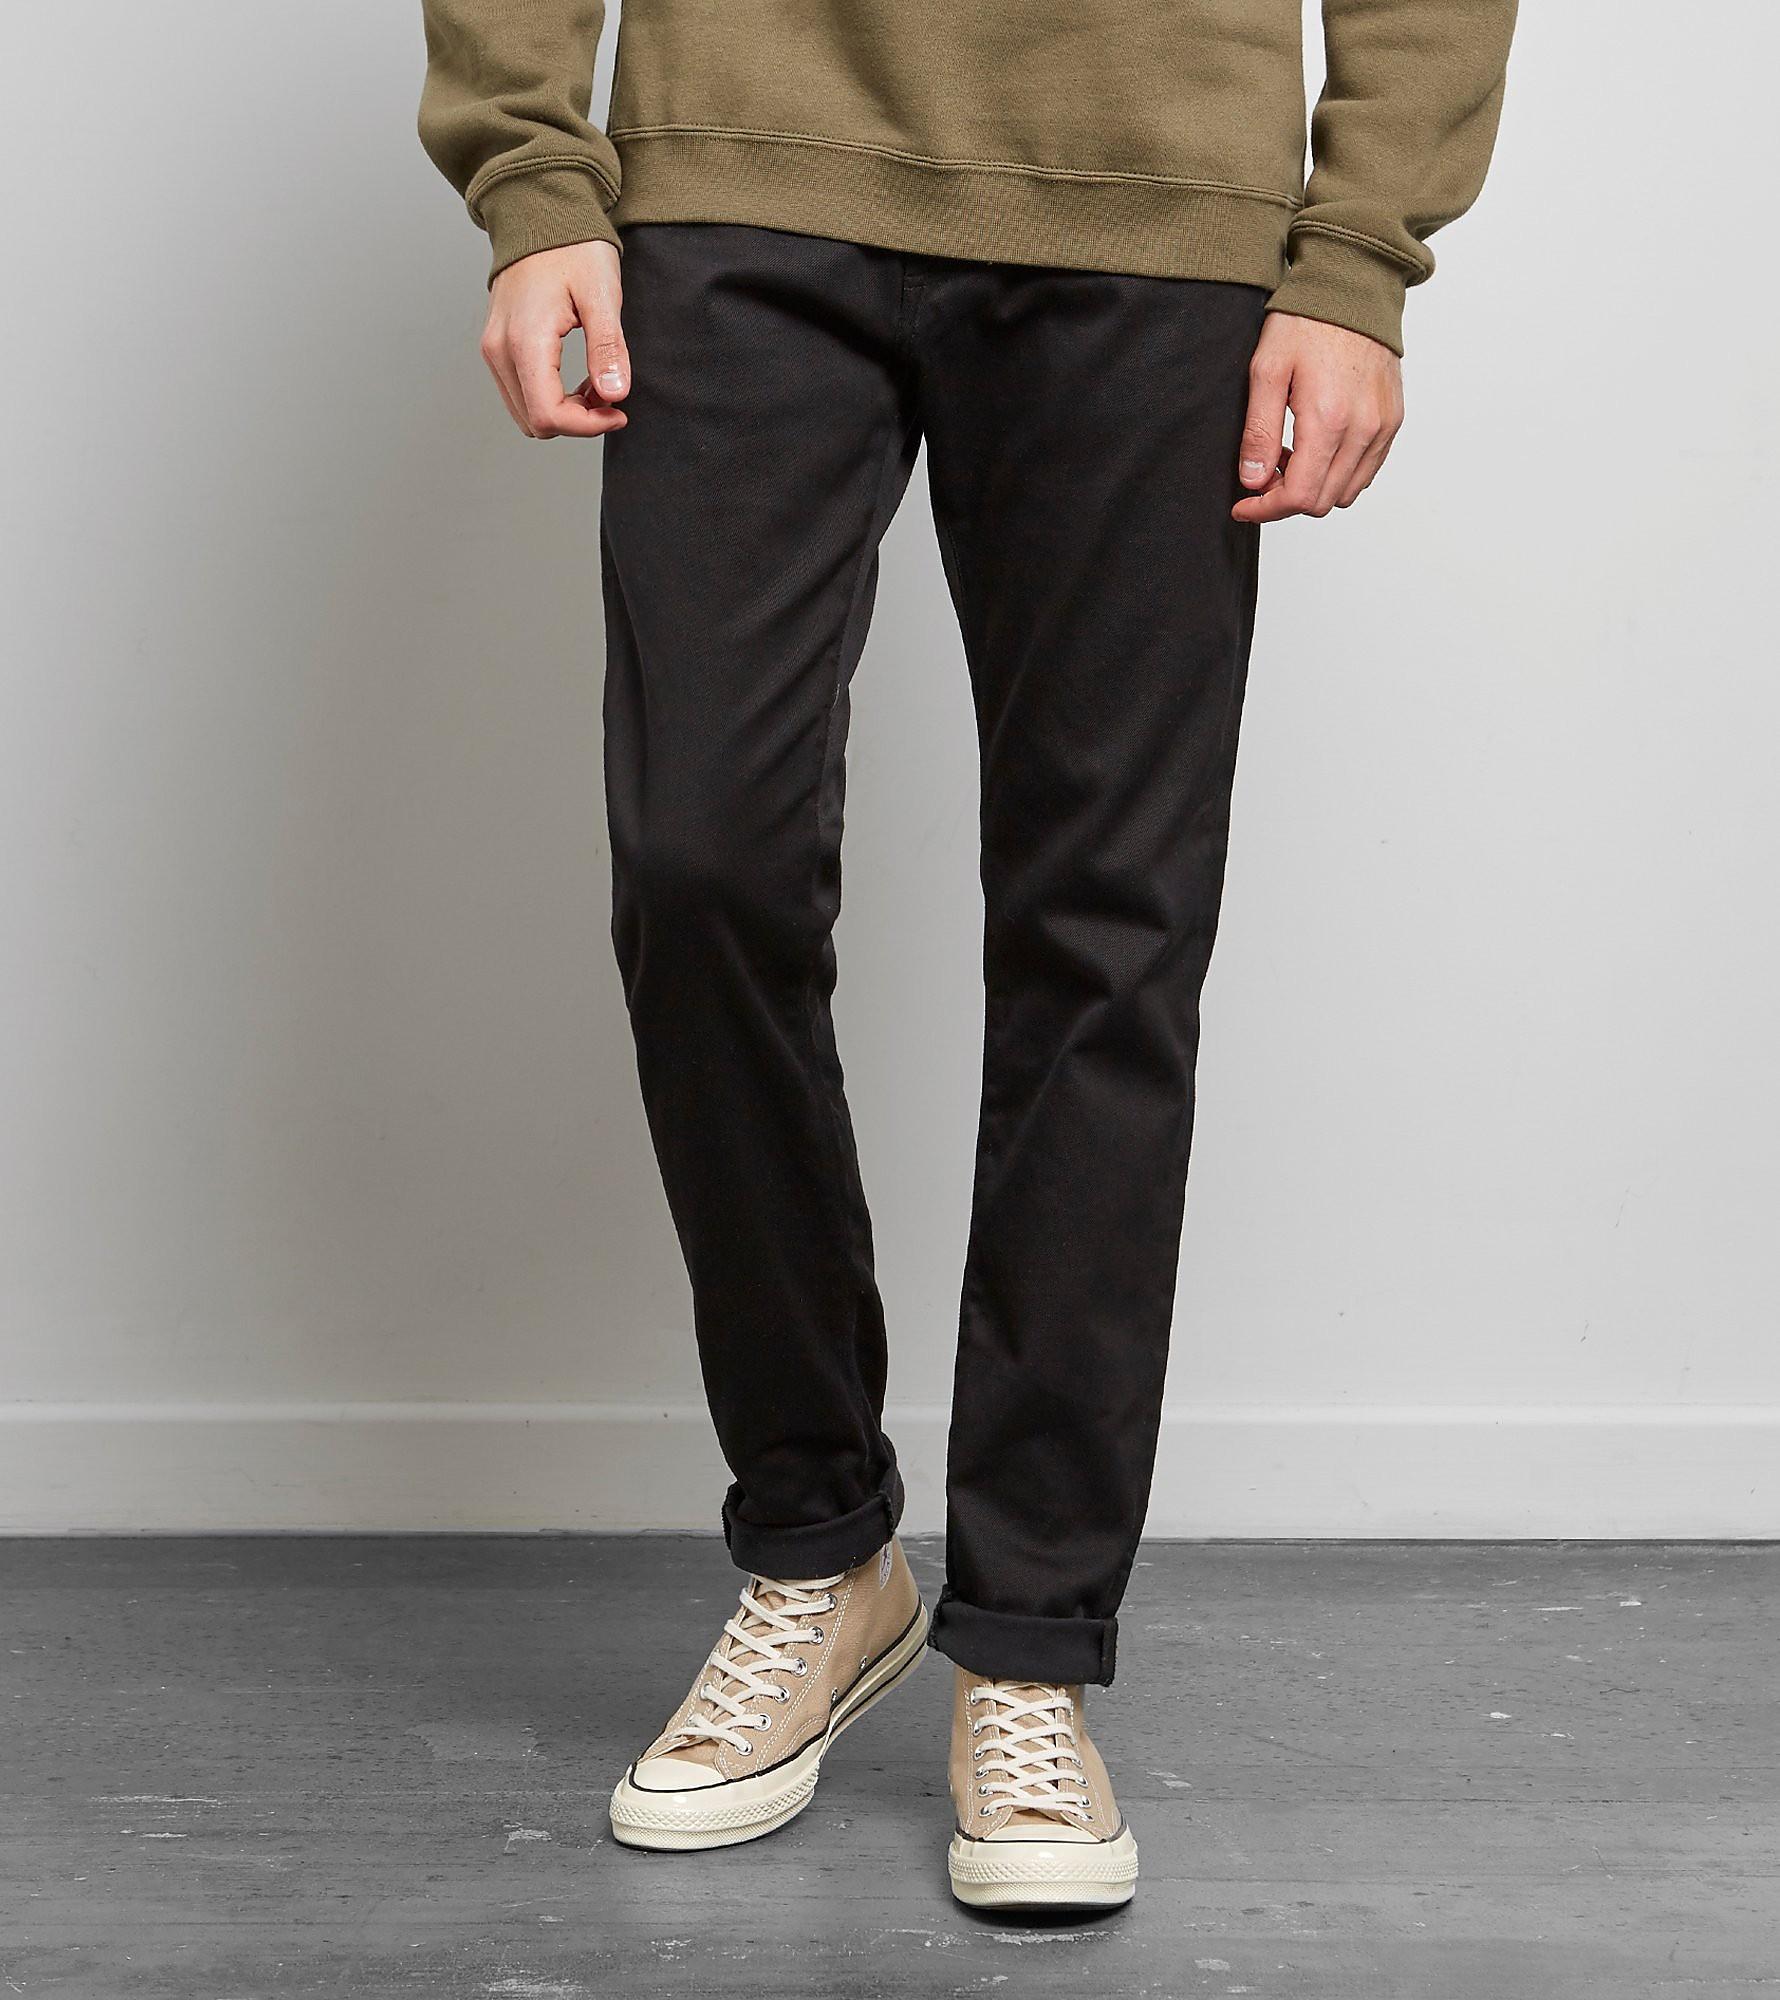 Edwin ED-85 Slim Tapered Drop Crotch Jeans